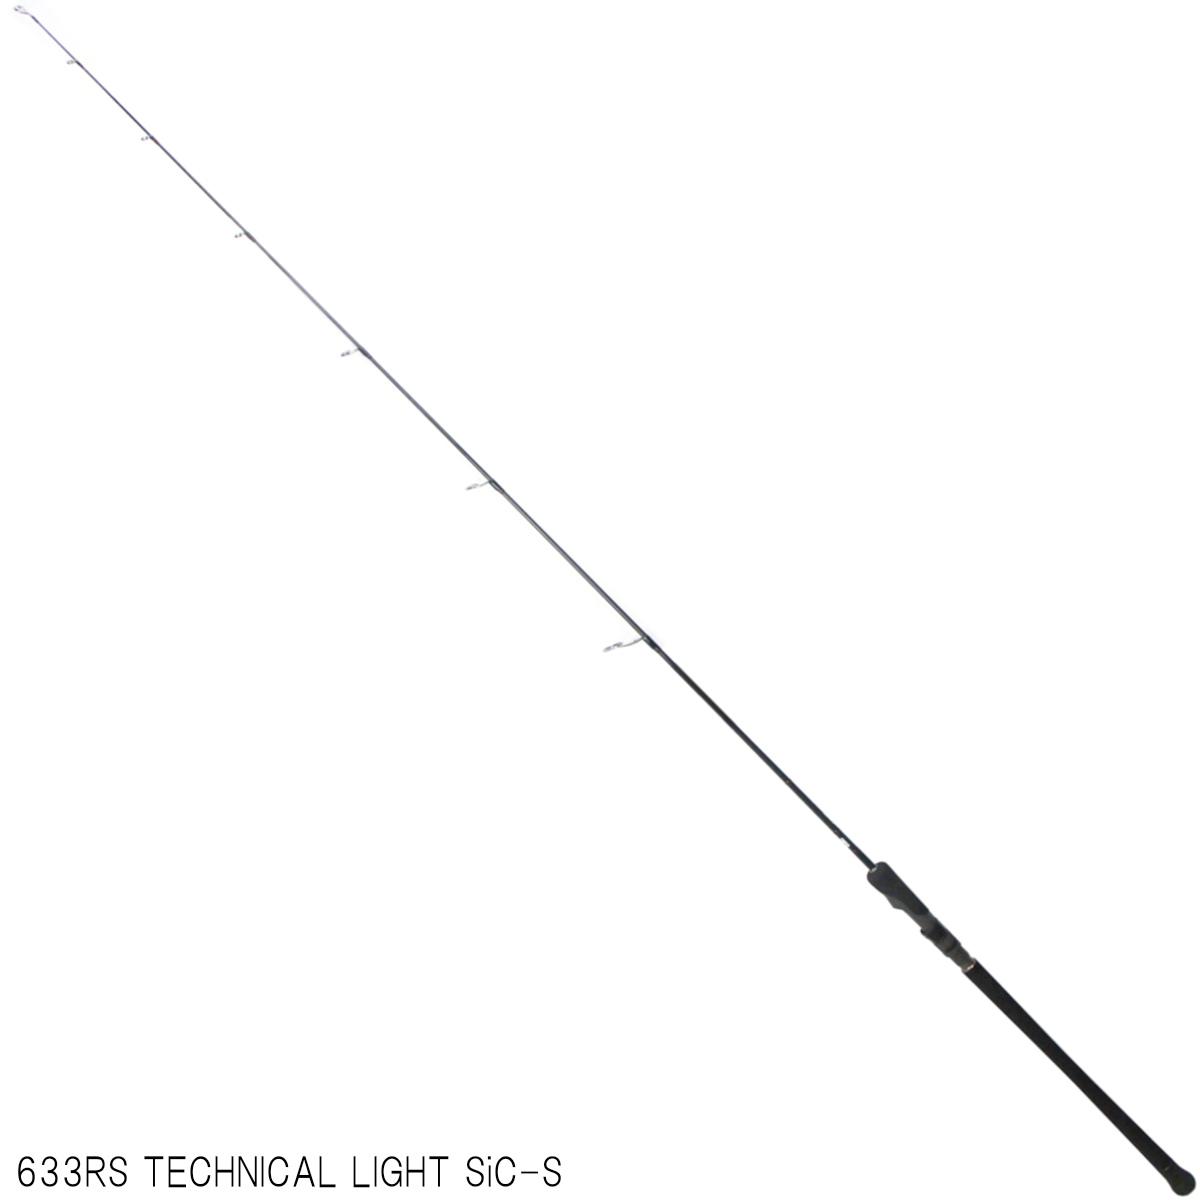 SSR Rigid 633RS TECHNICAL LIGHT SiC-S【大型商品】